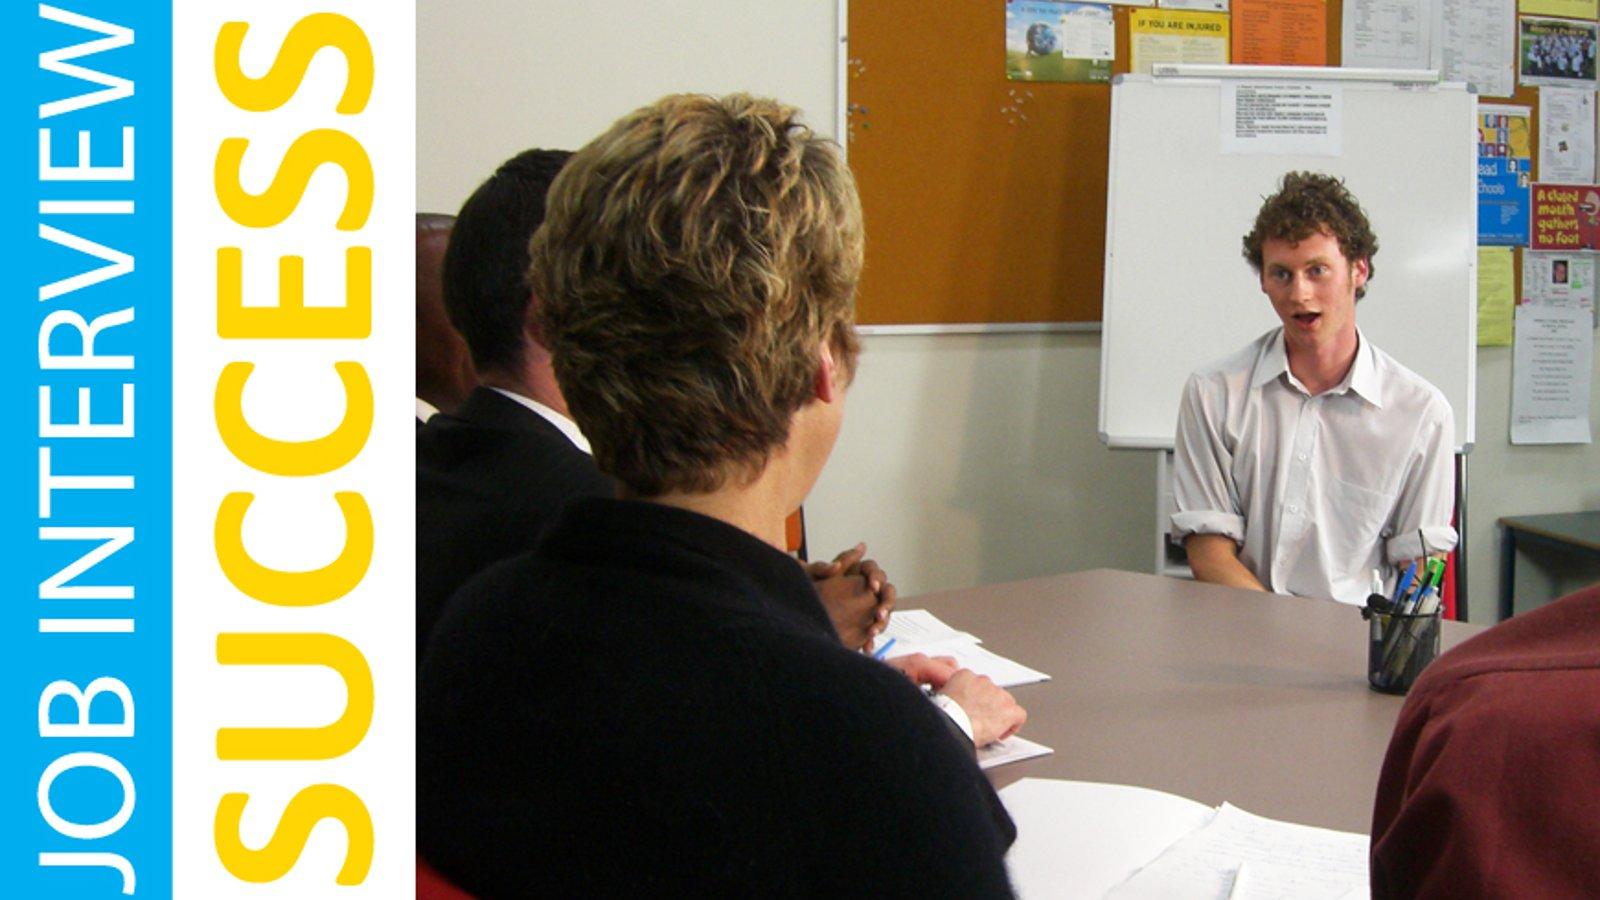 Job Interview Success Series 1